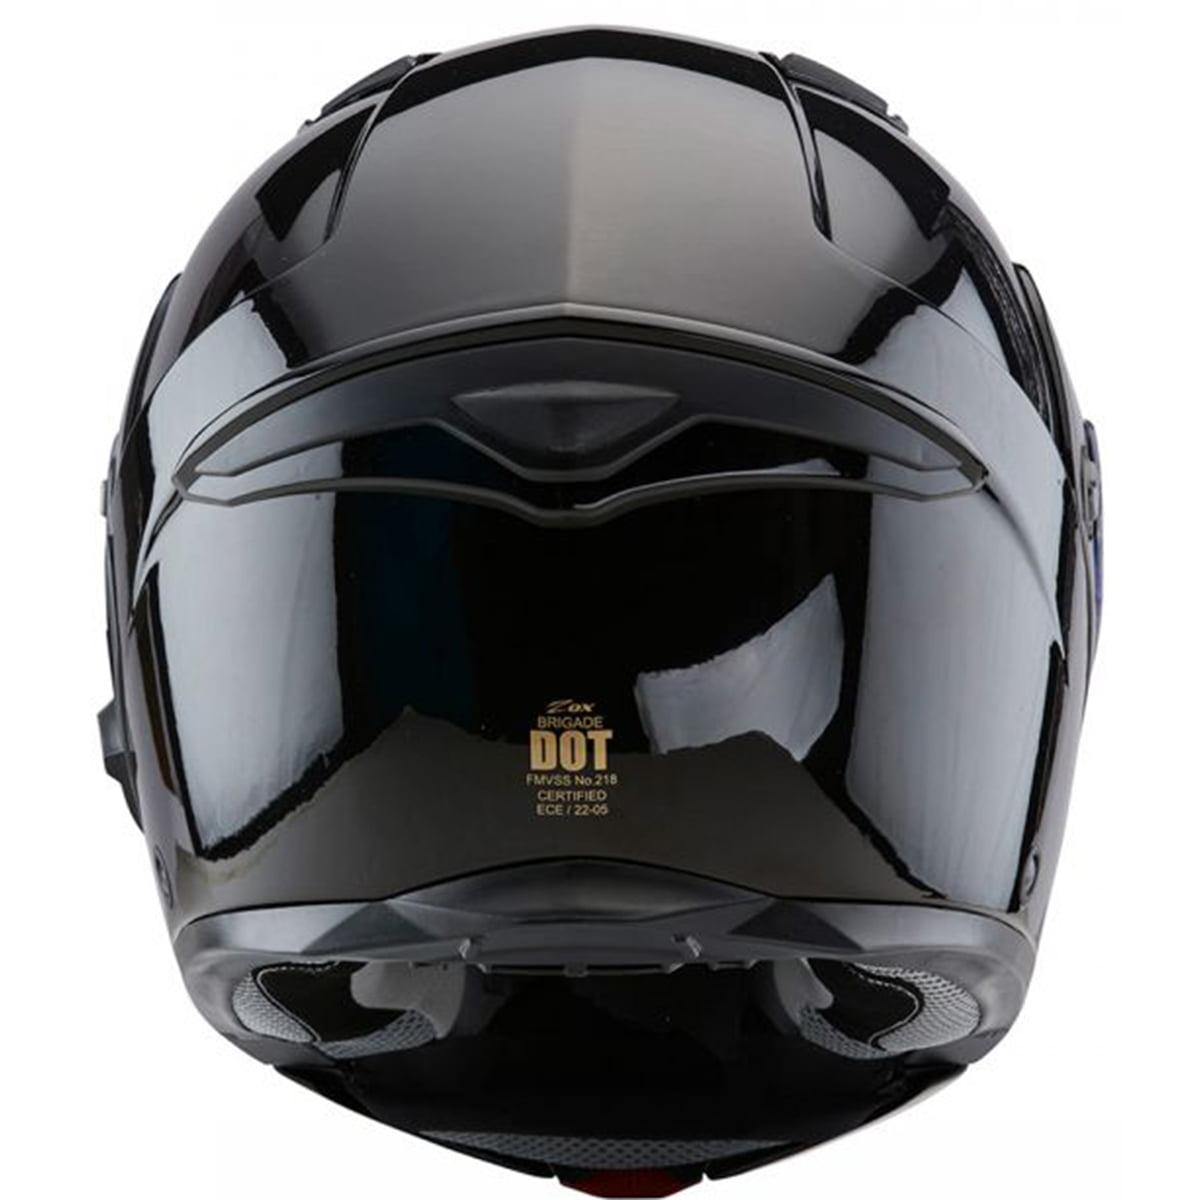 d8082a03 Zox Brigade SVS Modular Motorcycle Helmet Gloss Black - Walmart.com